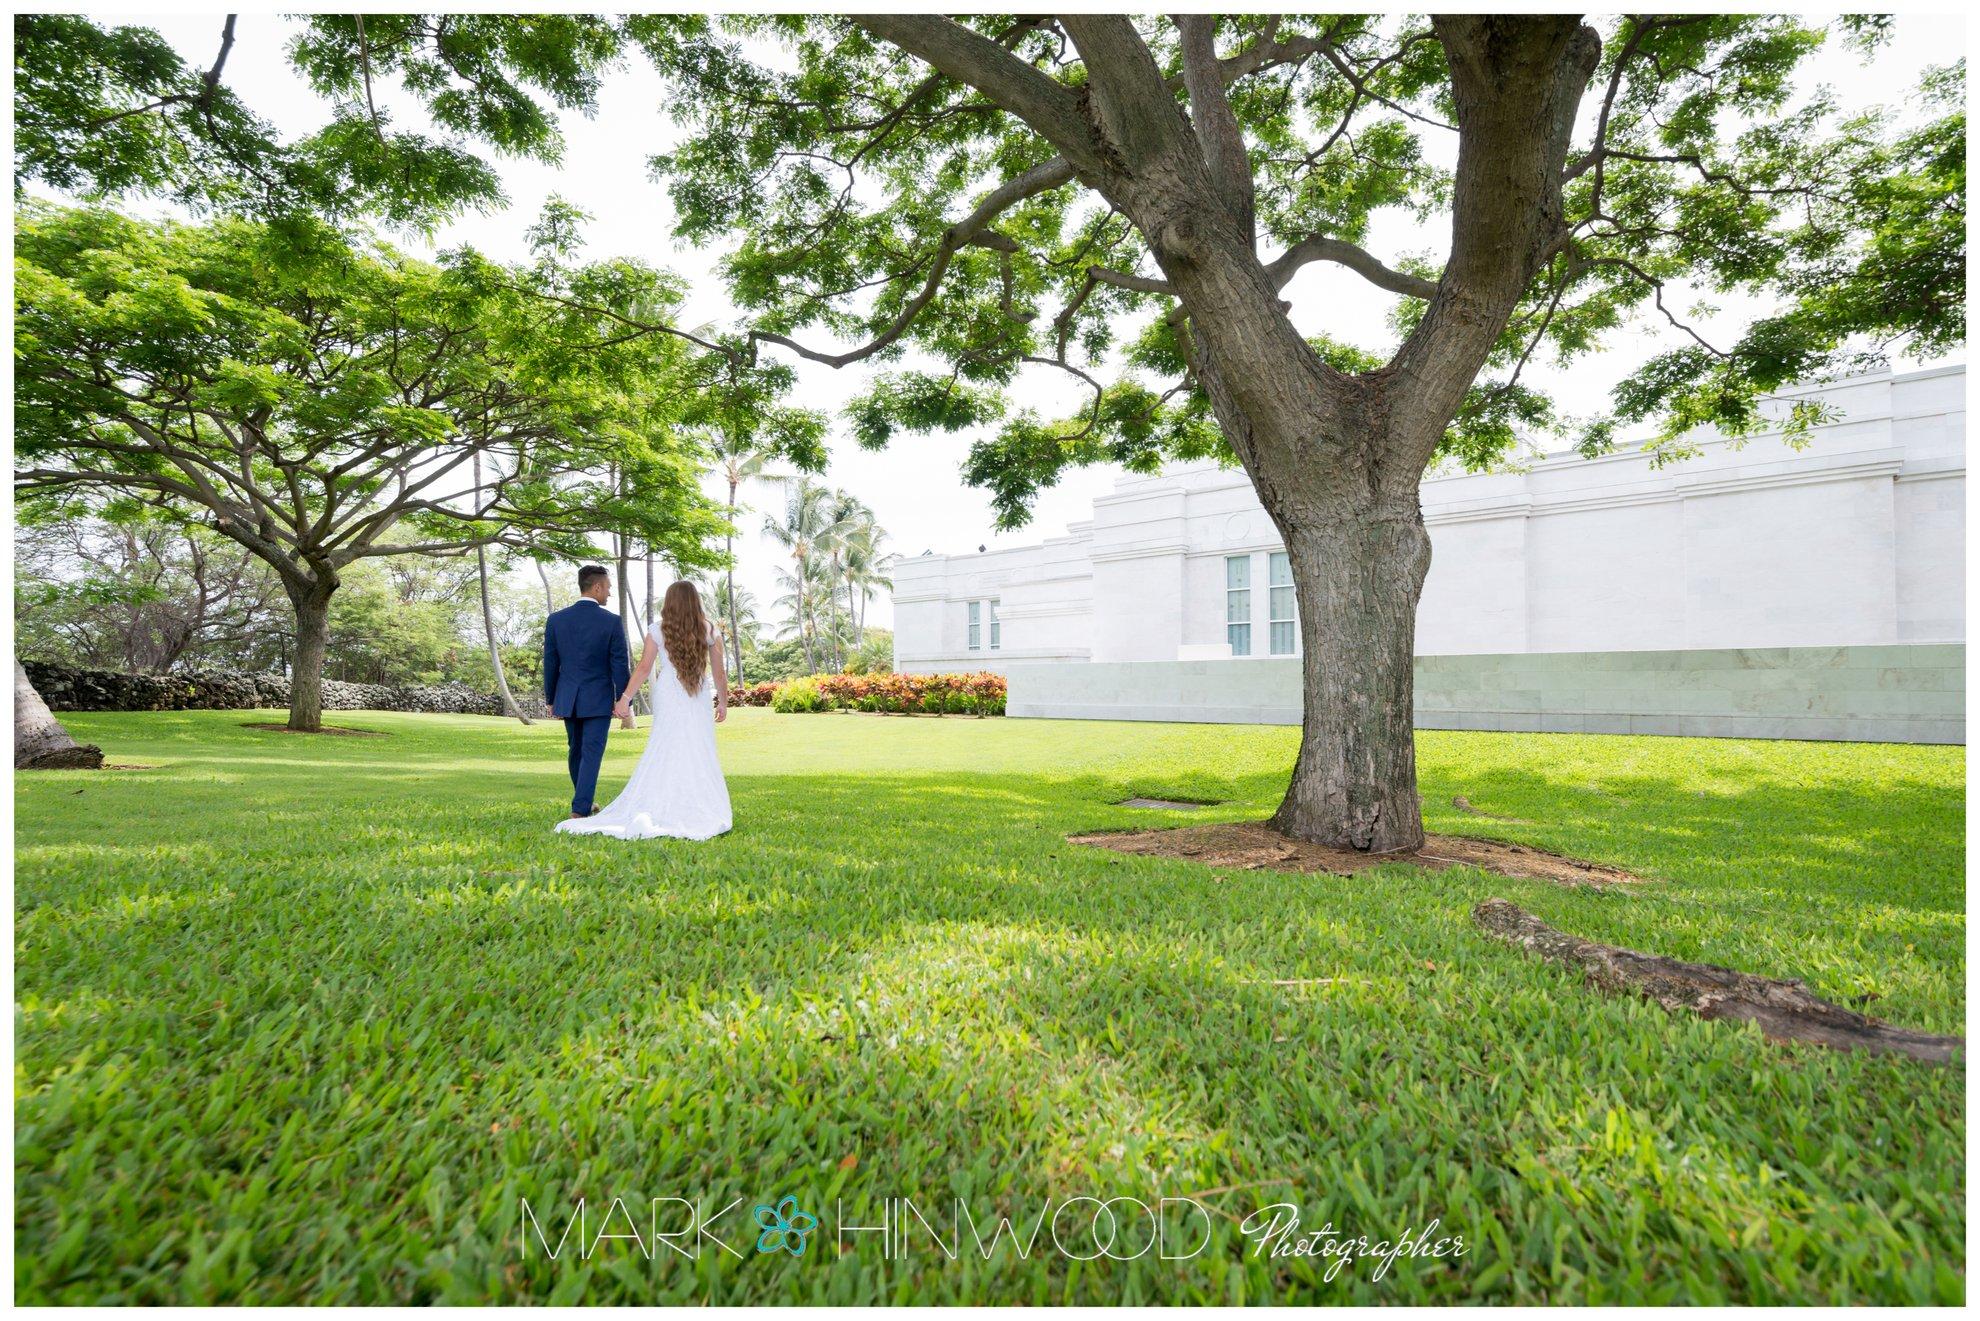 Kailua Kona Hawaii Weddings